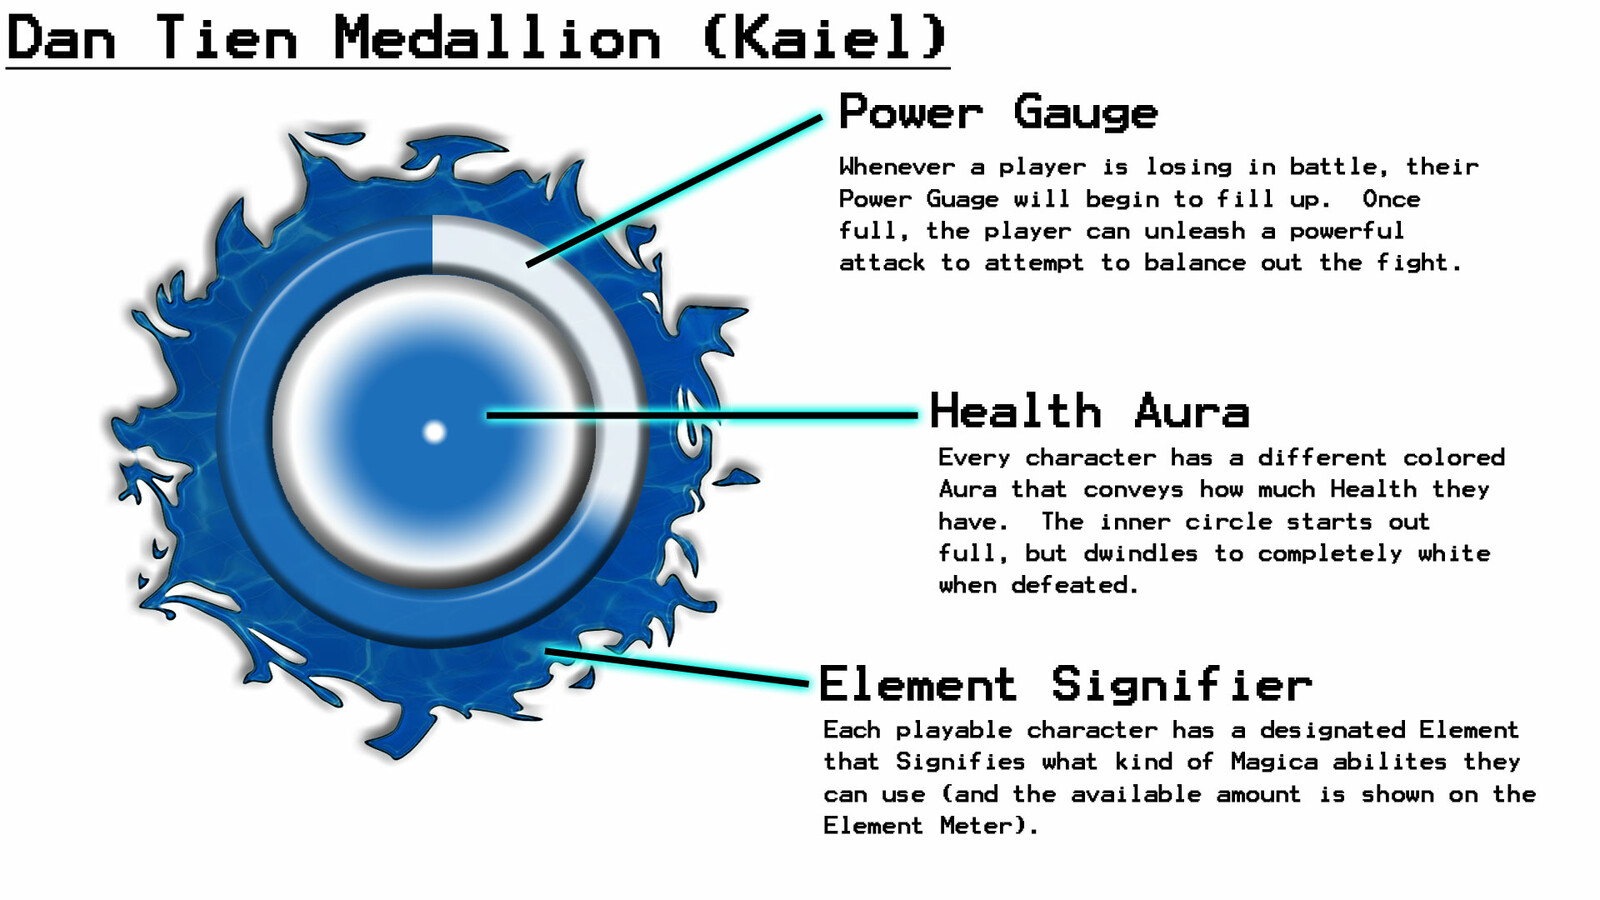 Explanation of the Dan Tien Medallion sprites (Yenen's)